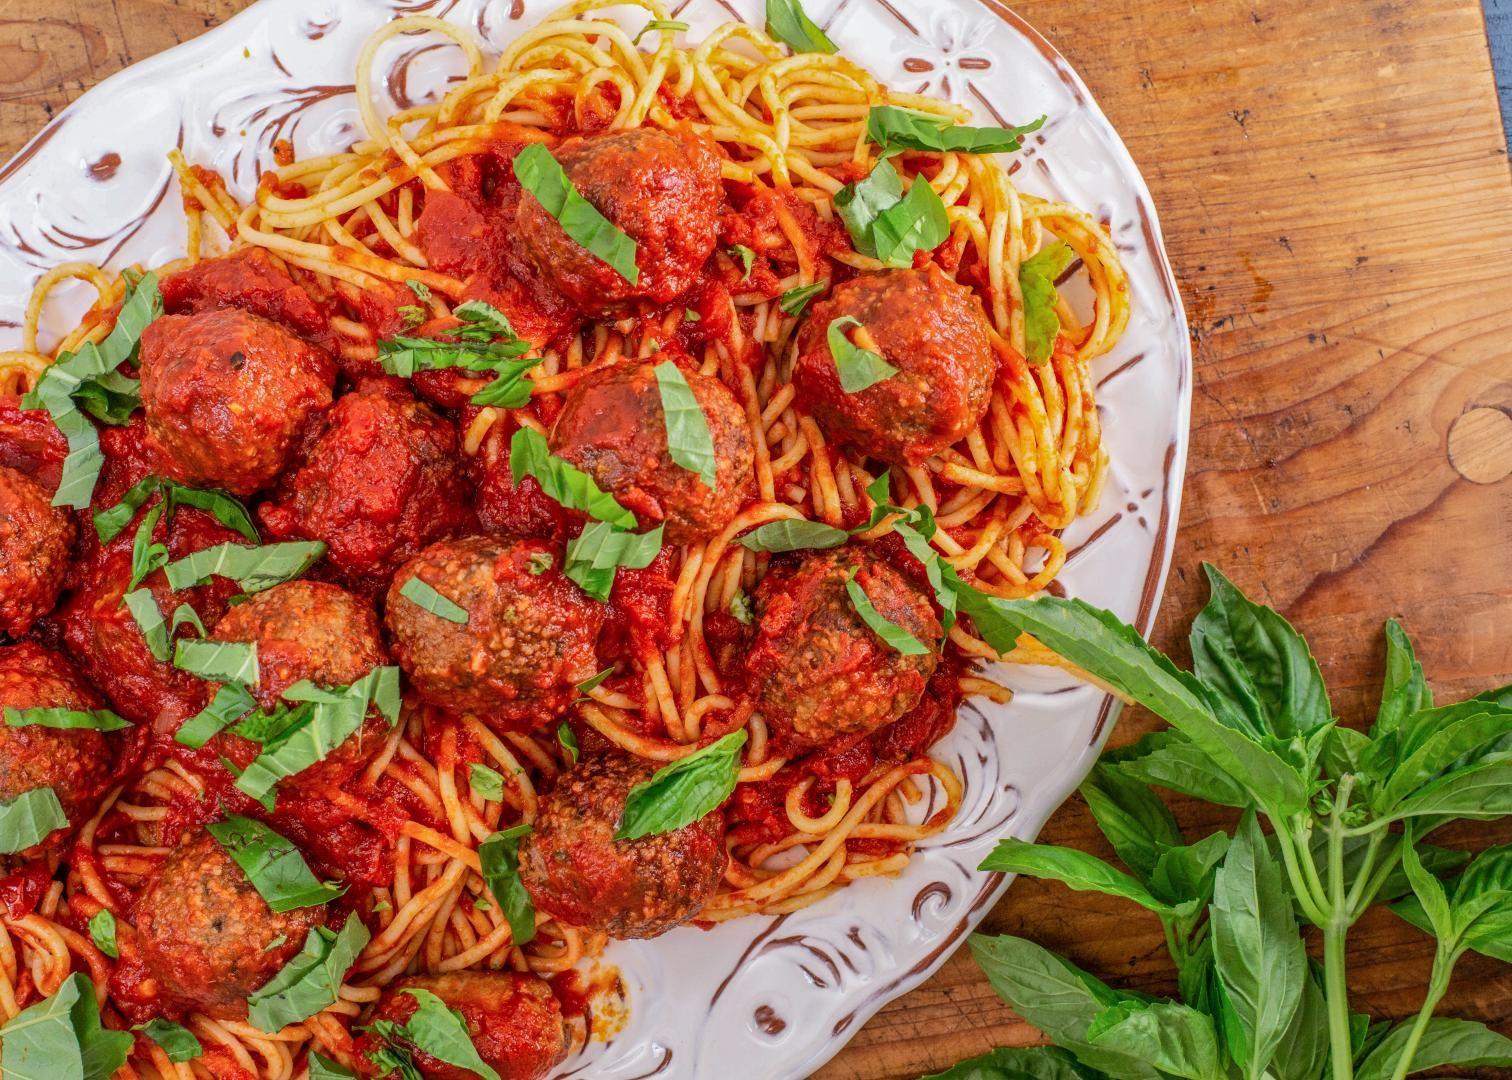 Elisabeth hasselbecks glutenfree spaghetti and meatballs